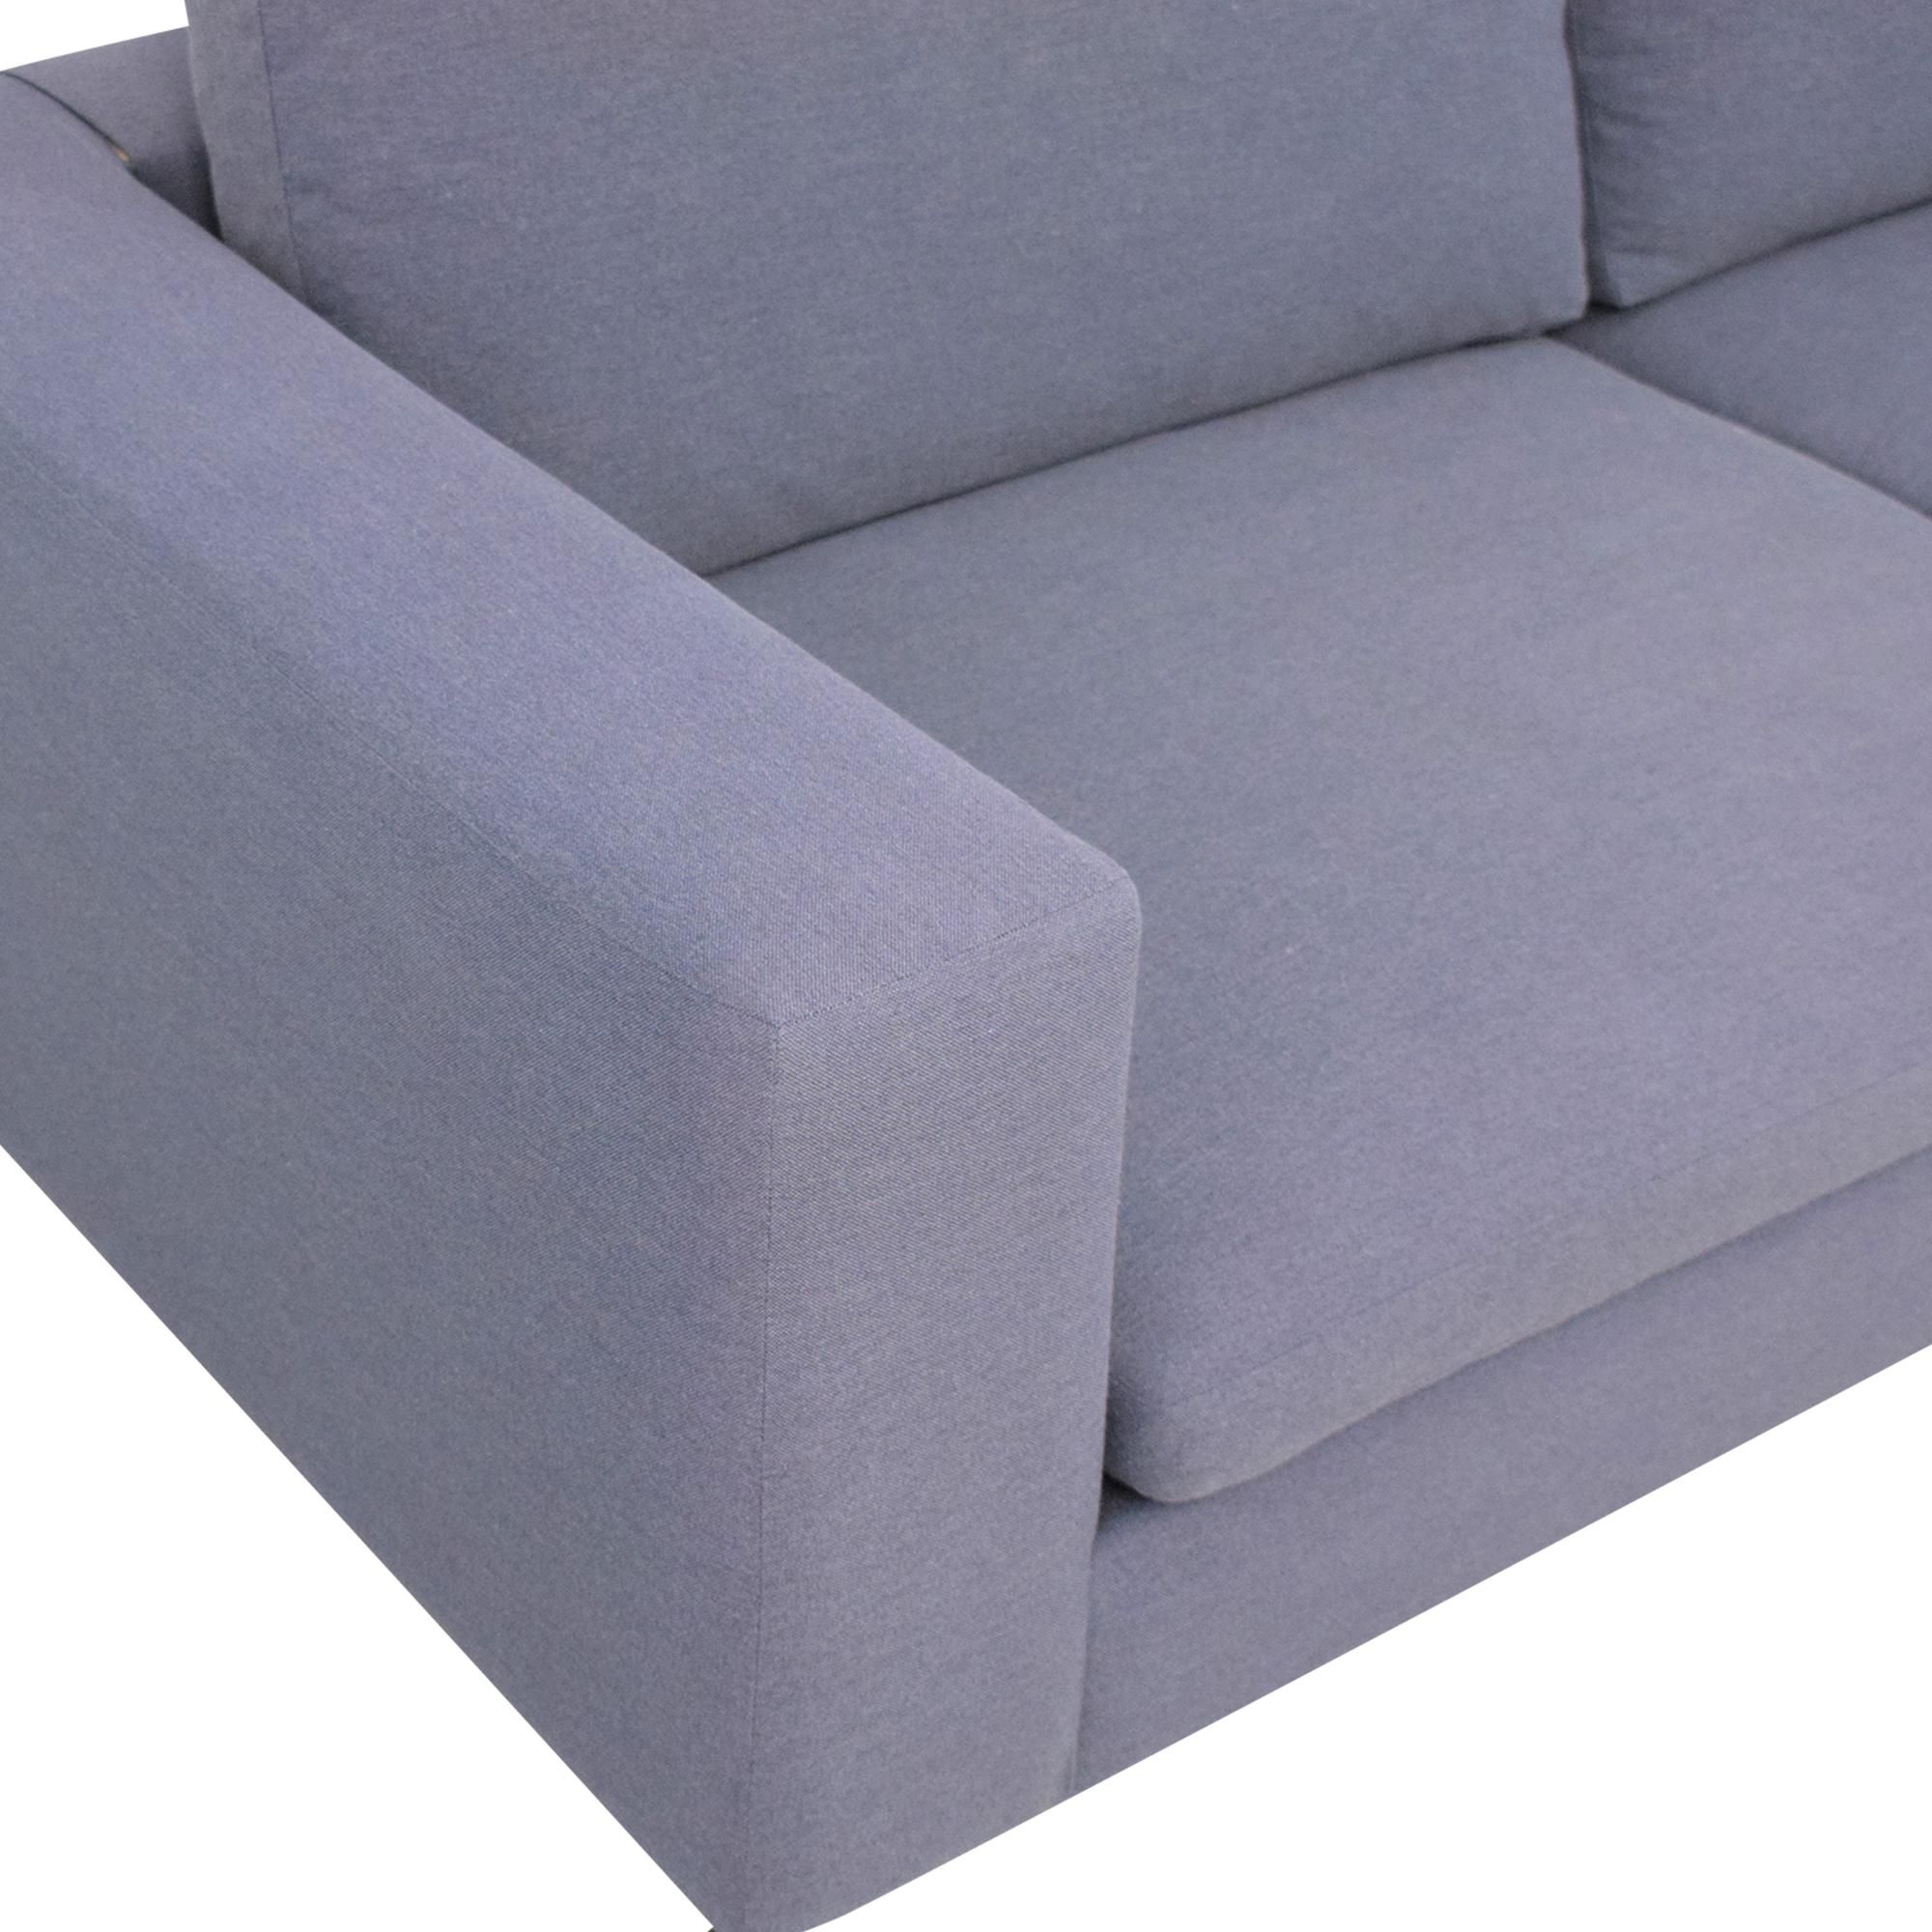 Blu Dot Blu Dot New Standard Sectional Sofa